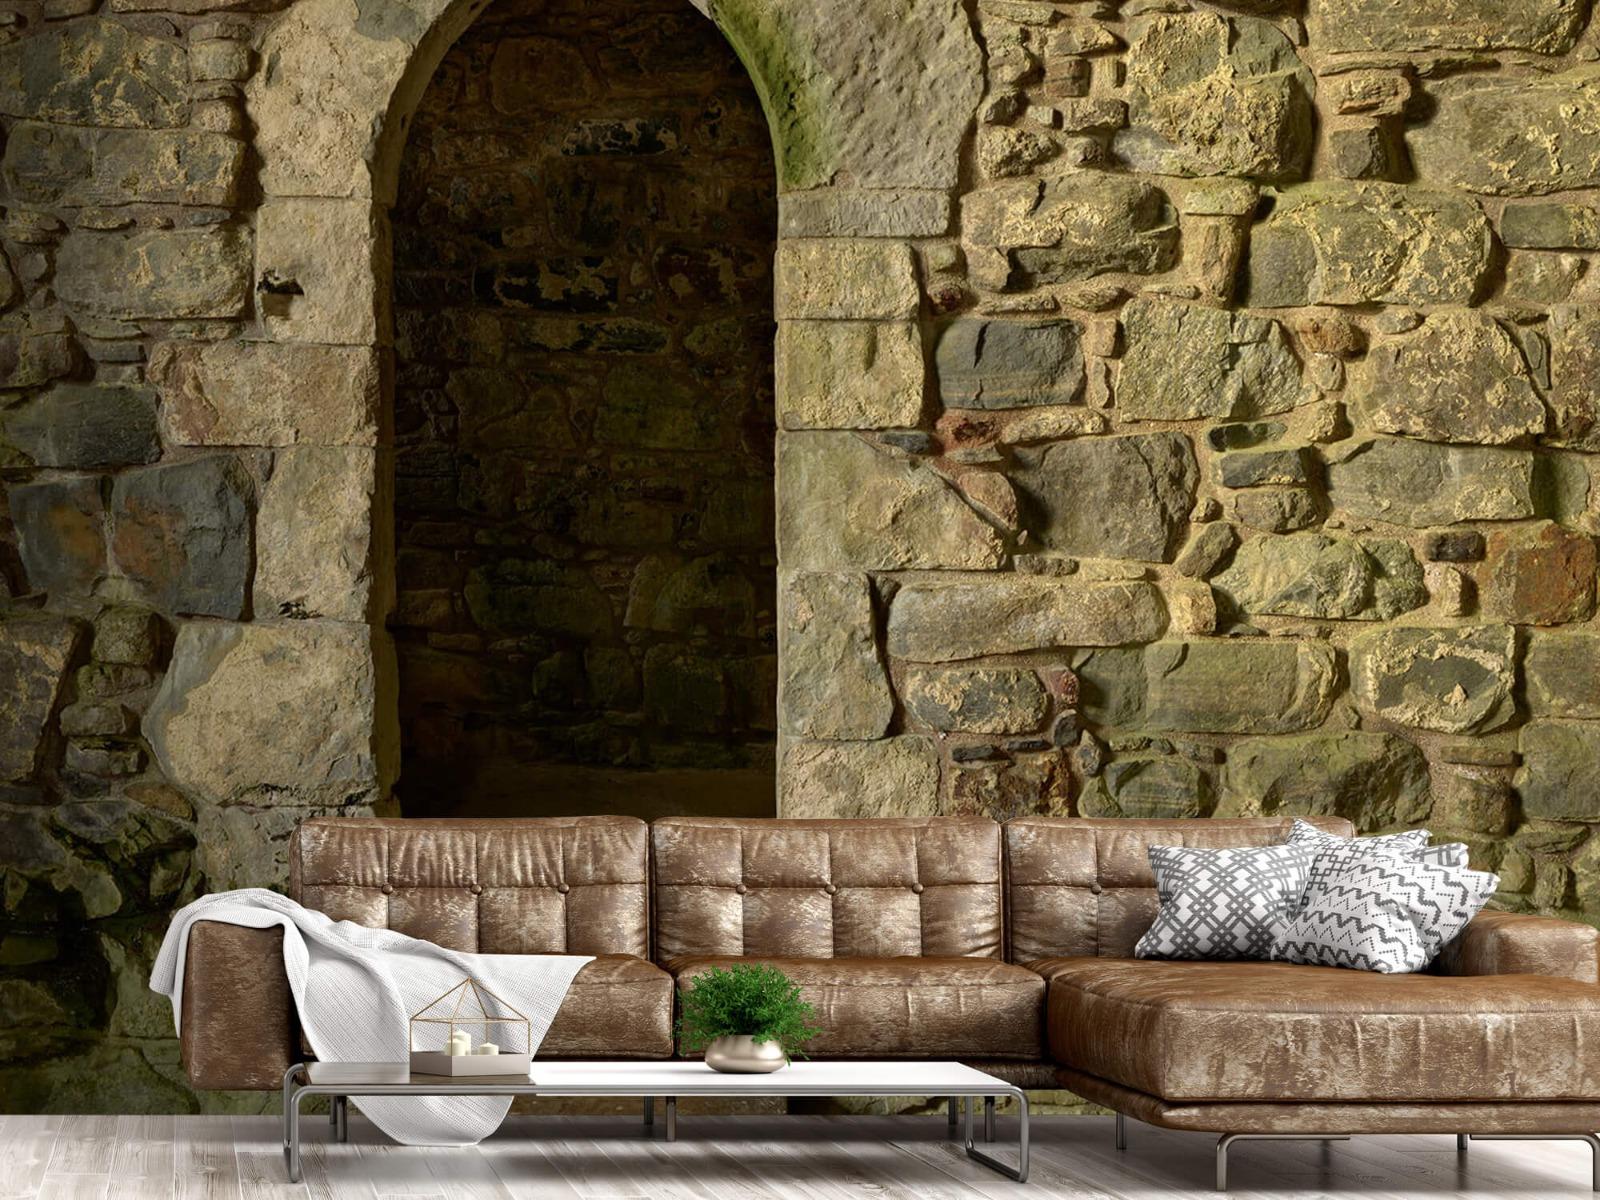 Steen behang - Oude muur met doorgang - Slaapkamer 14